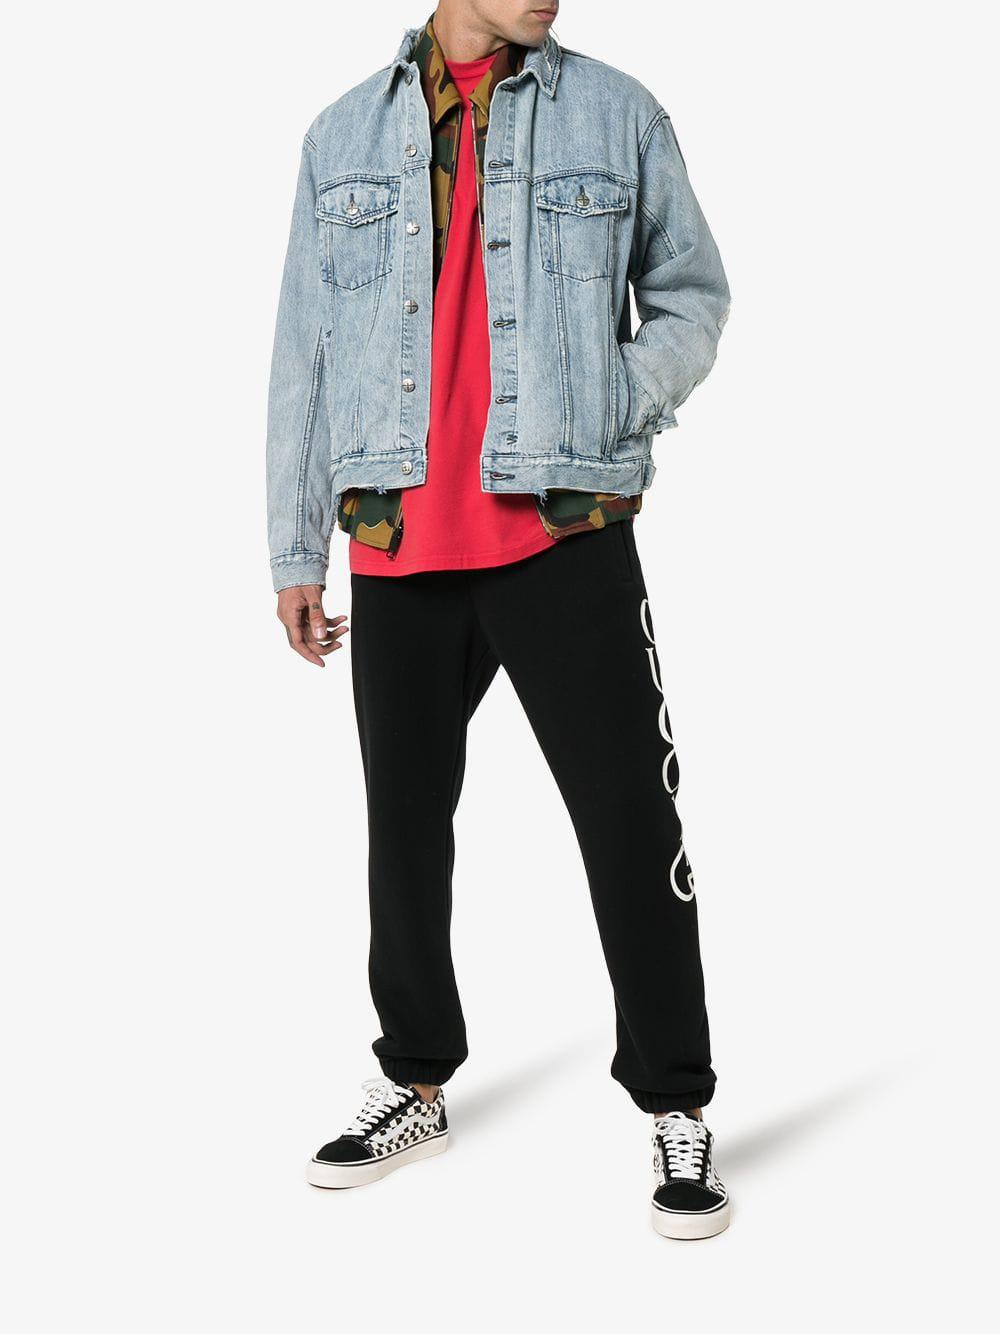 b71be247f7 Lyst - Ksubi Oh G Distressed Denim Jacket in Blue for Men - Save 18%